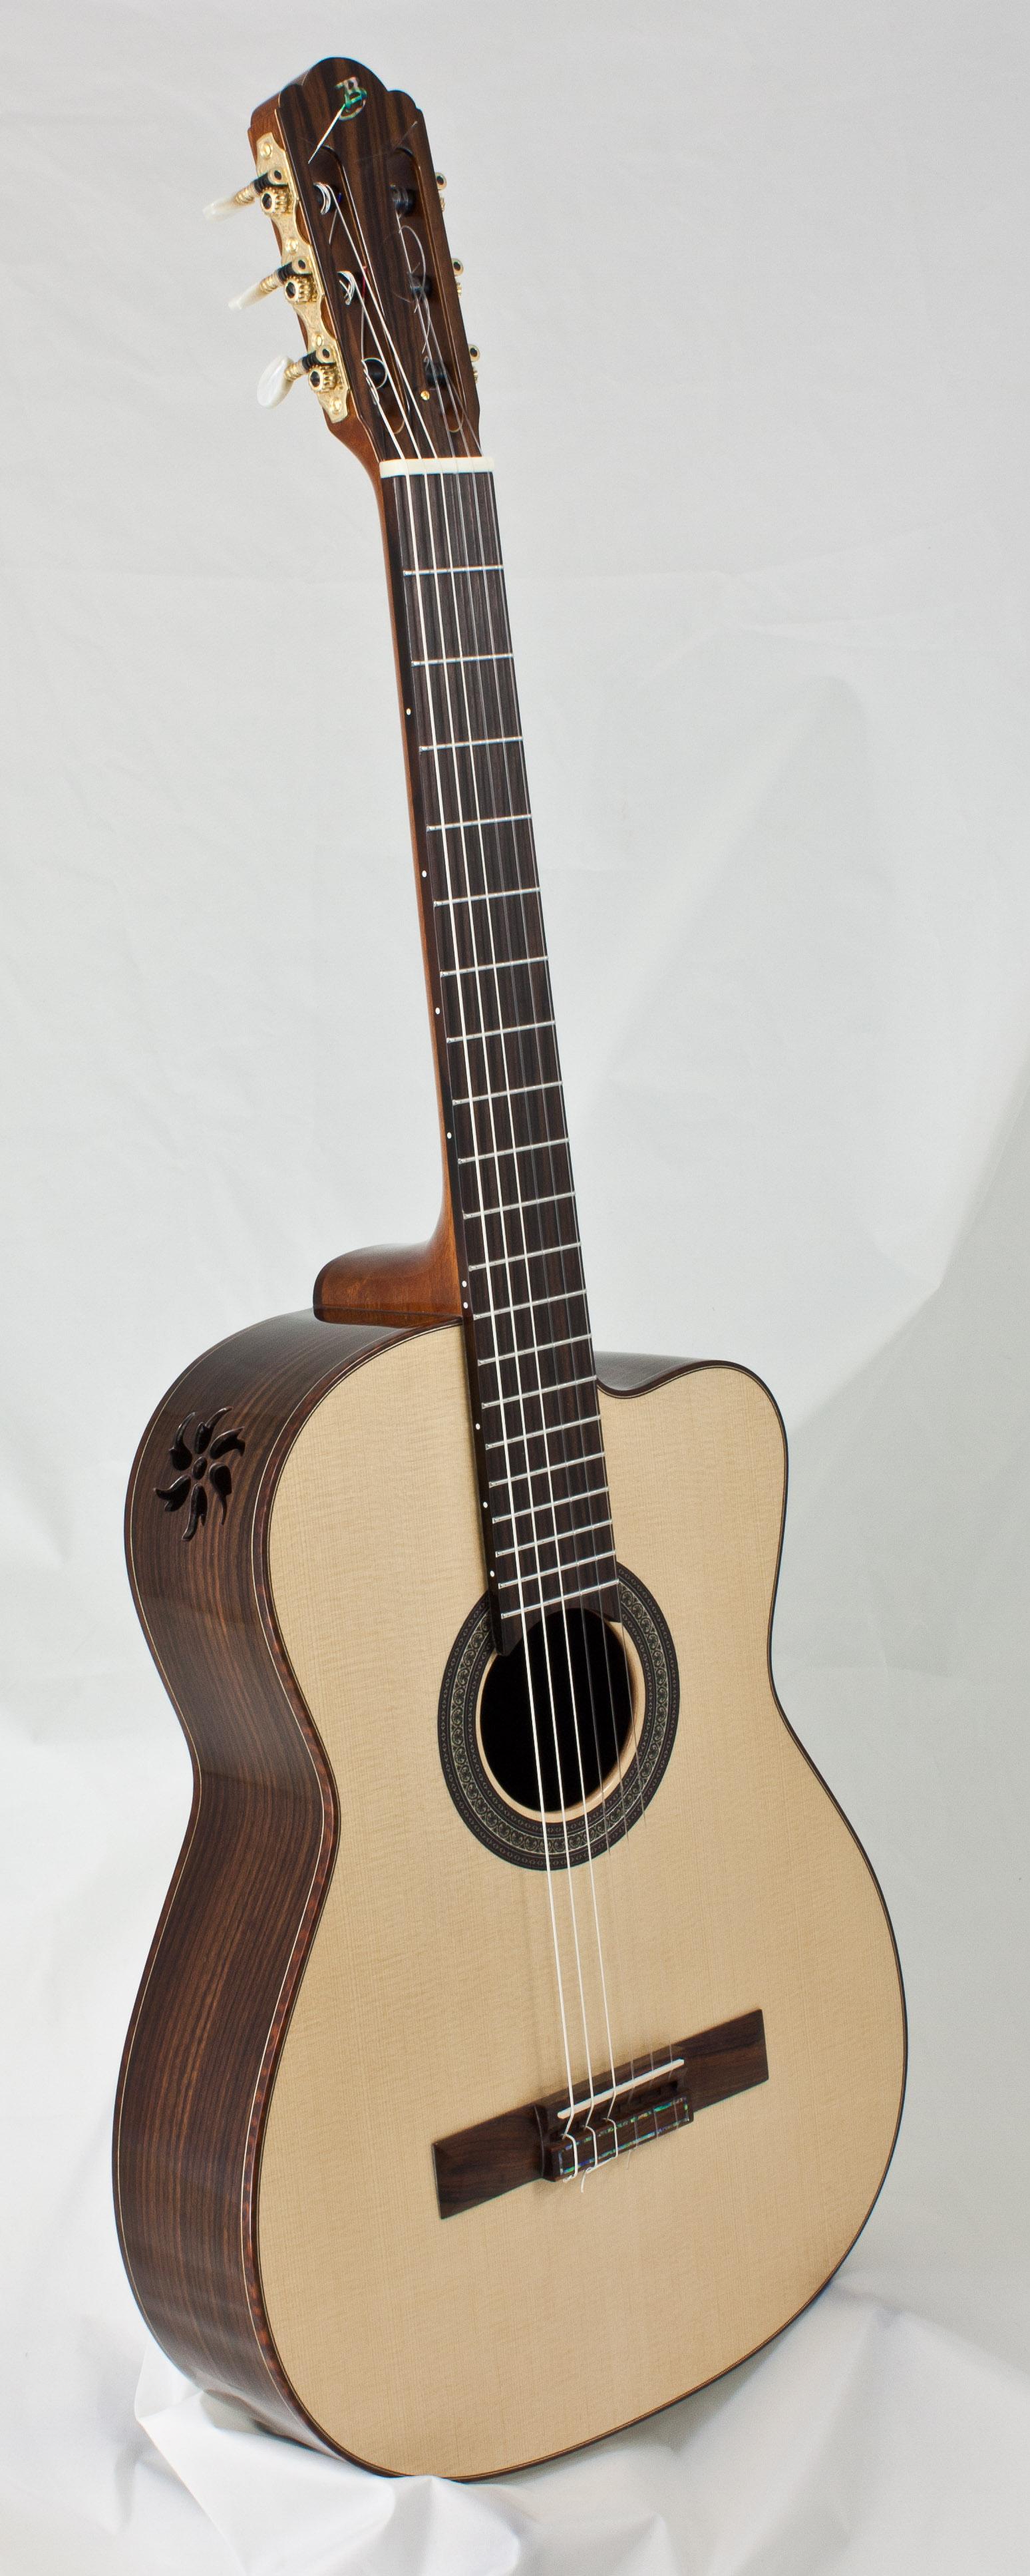 boliviancab-3 - Copy - Copy.JPG